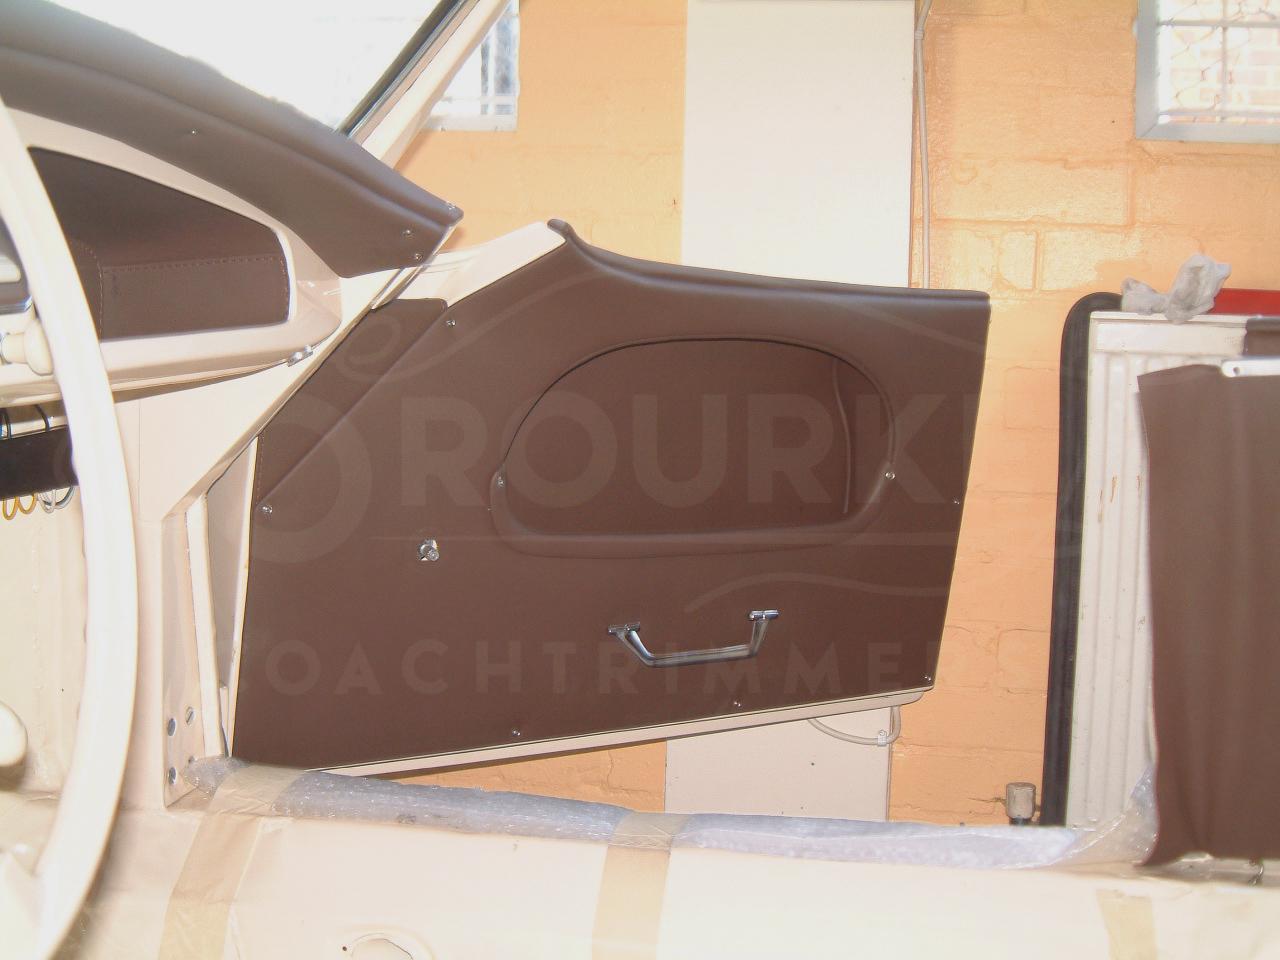 o-rourke-coachtrimmers-porsche-356-america-1.jpg